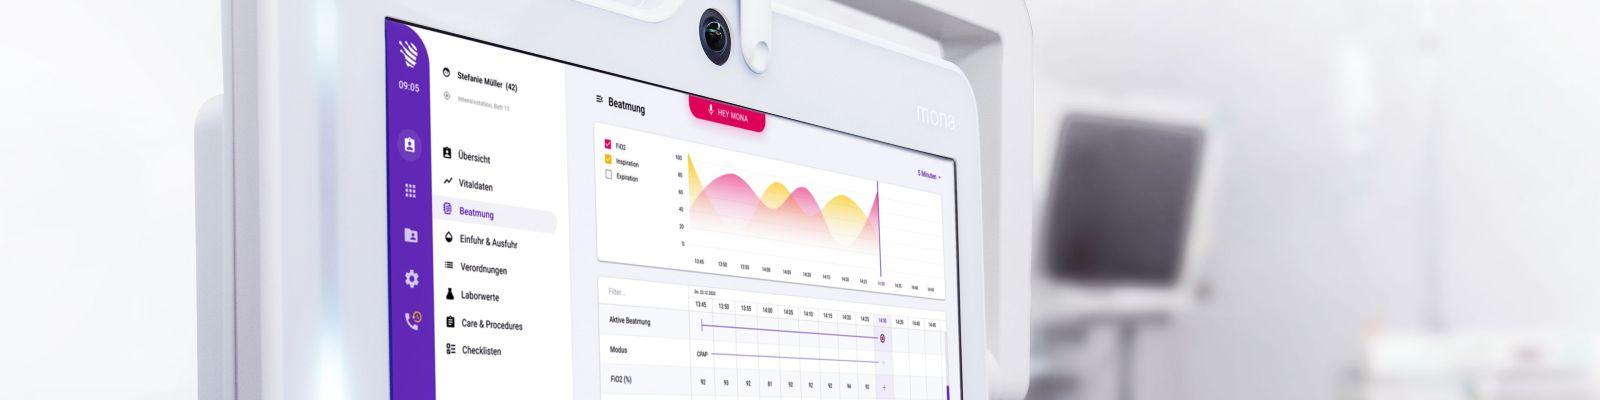 Assistenzsystem Mona - Monitoring am Krankenbett